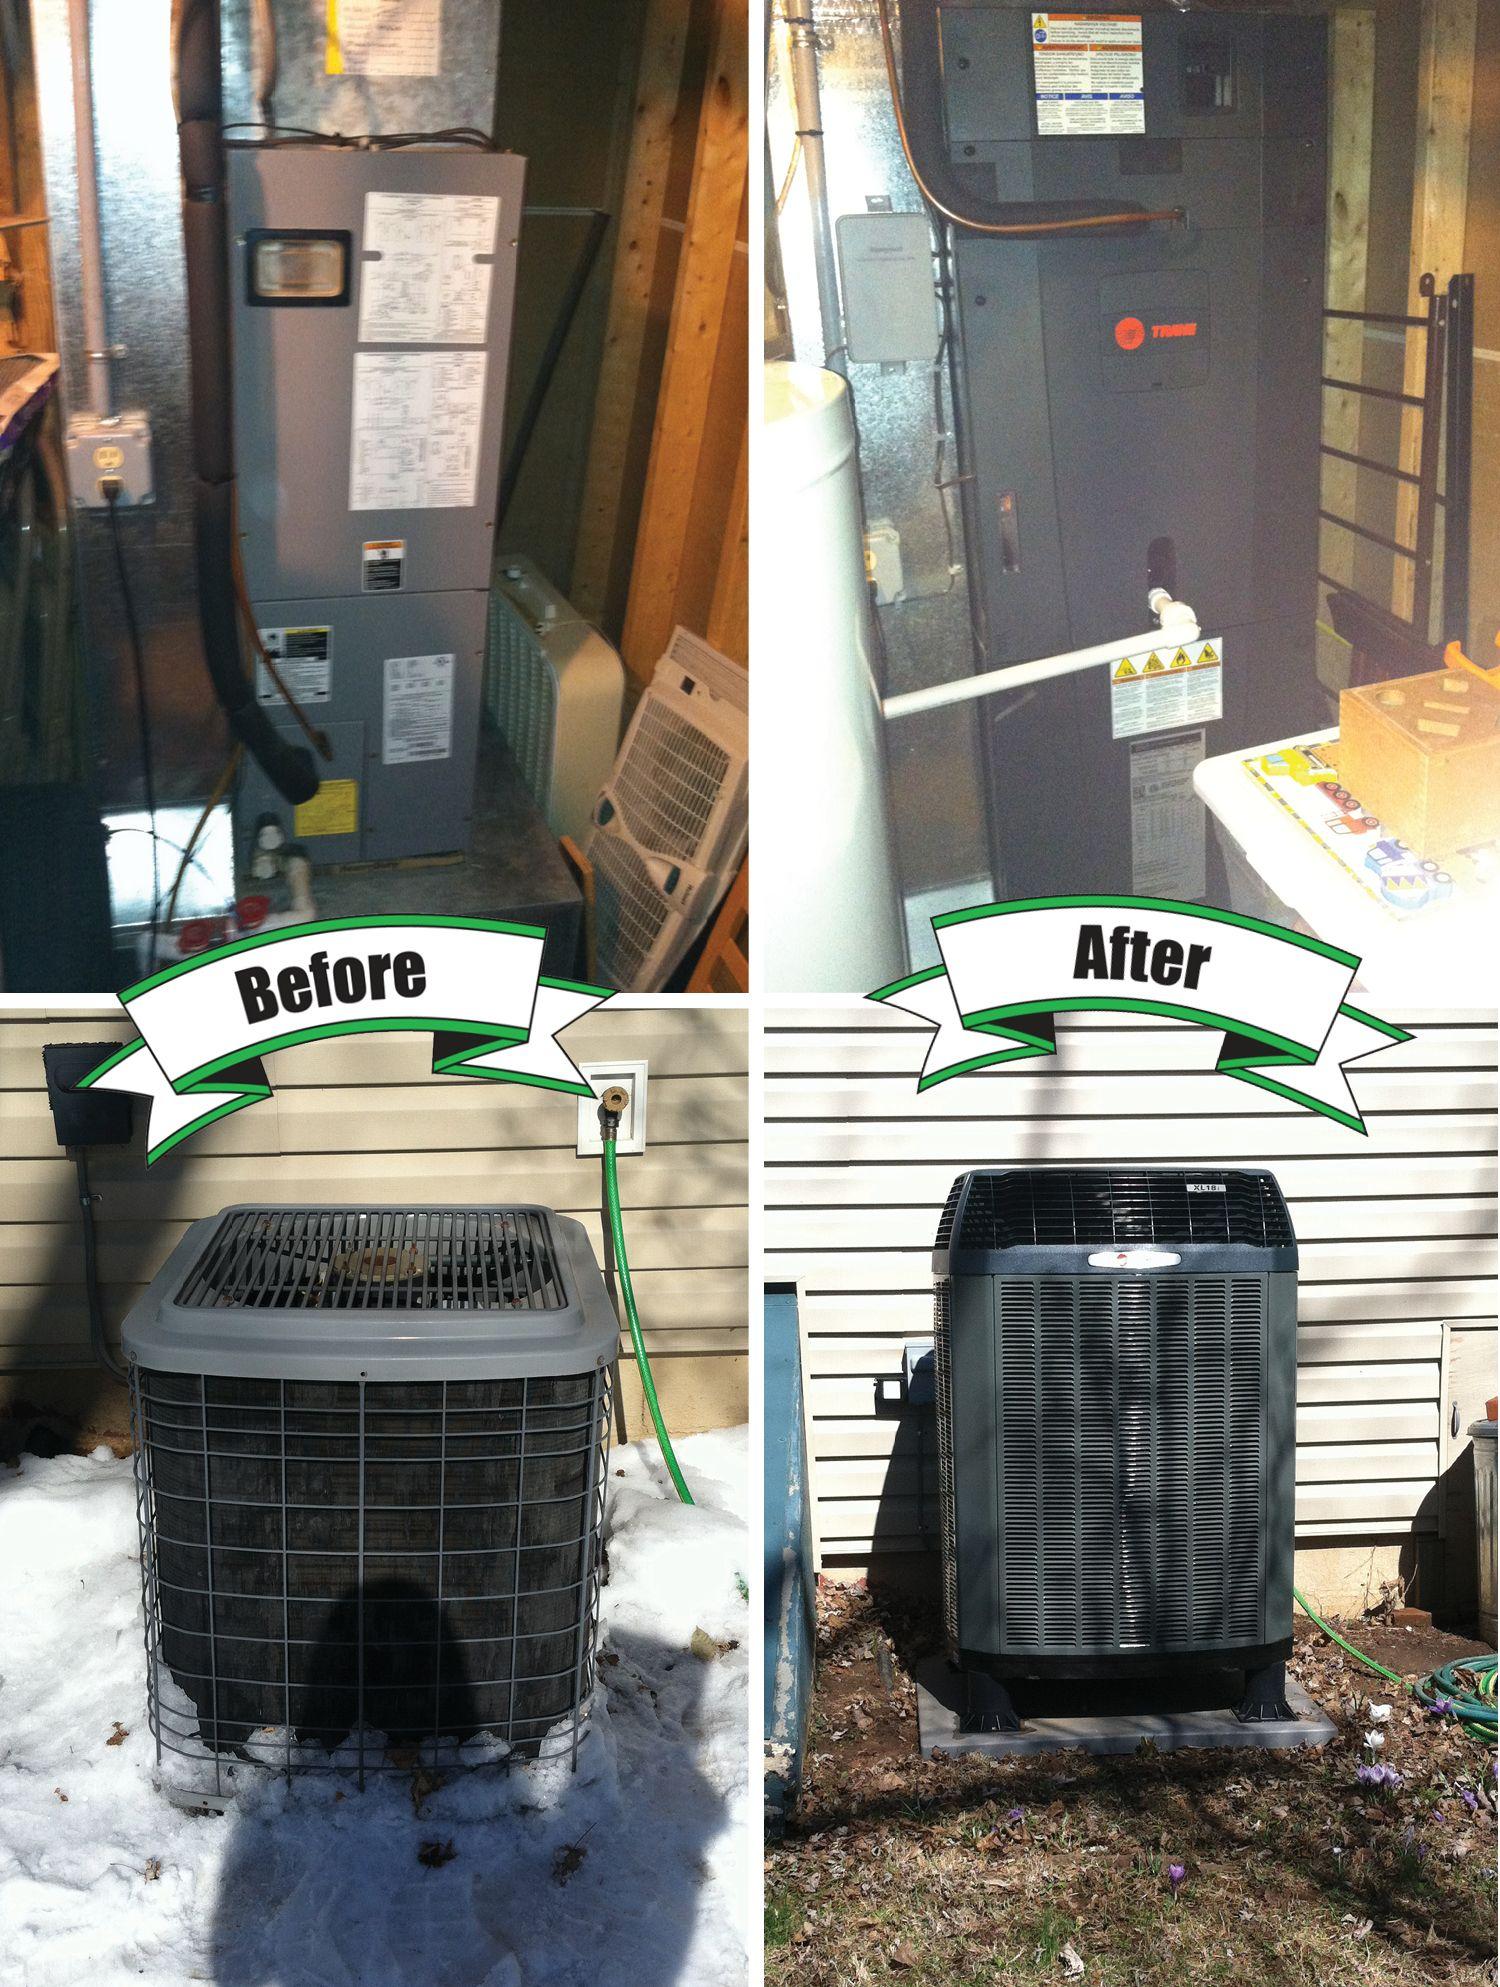 Holtzopleheatingandairconditioning Beforeandafter Heating And